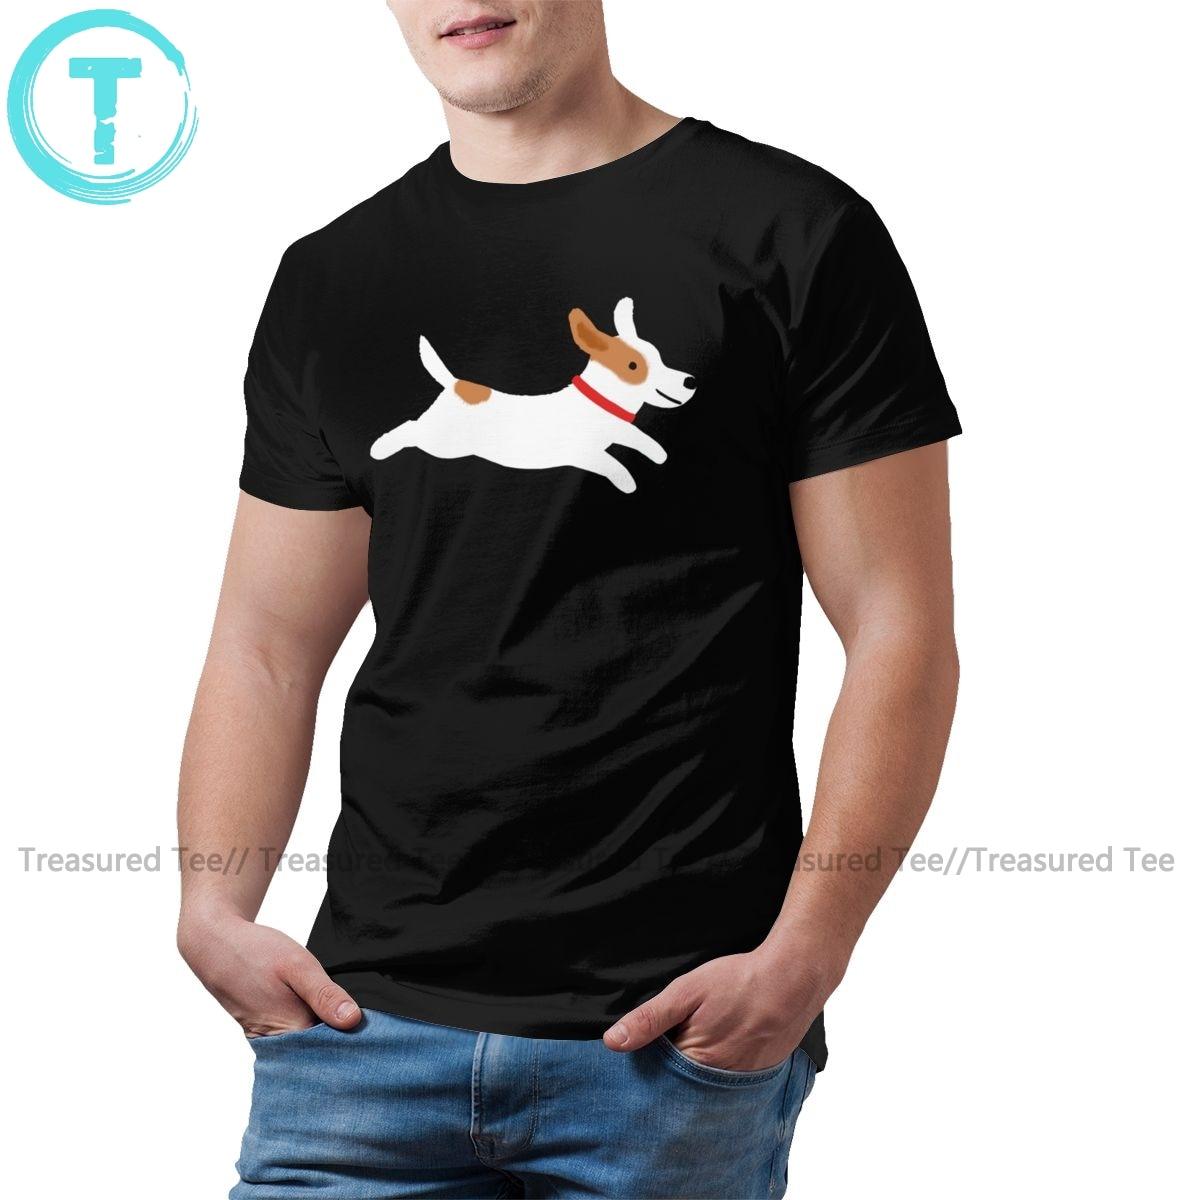 Jack Russell Terrier T Shirt Terrier Running T-Shirt dla psów śliczne 100 procent bawełniana koszulka klasyczna męska koszulka